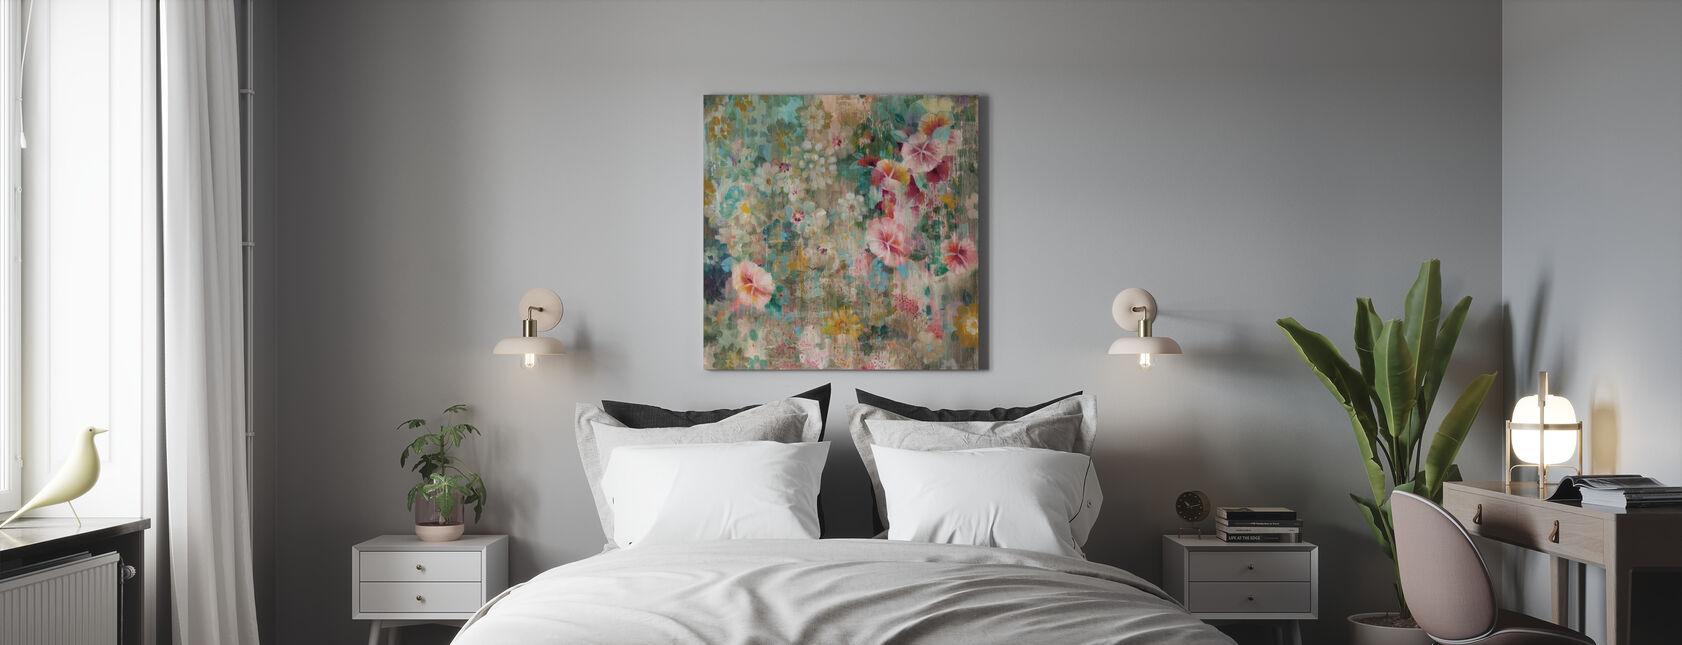 Blumendusche - Leinwandbild - Schlafzimmer